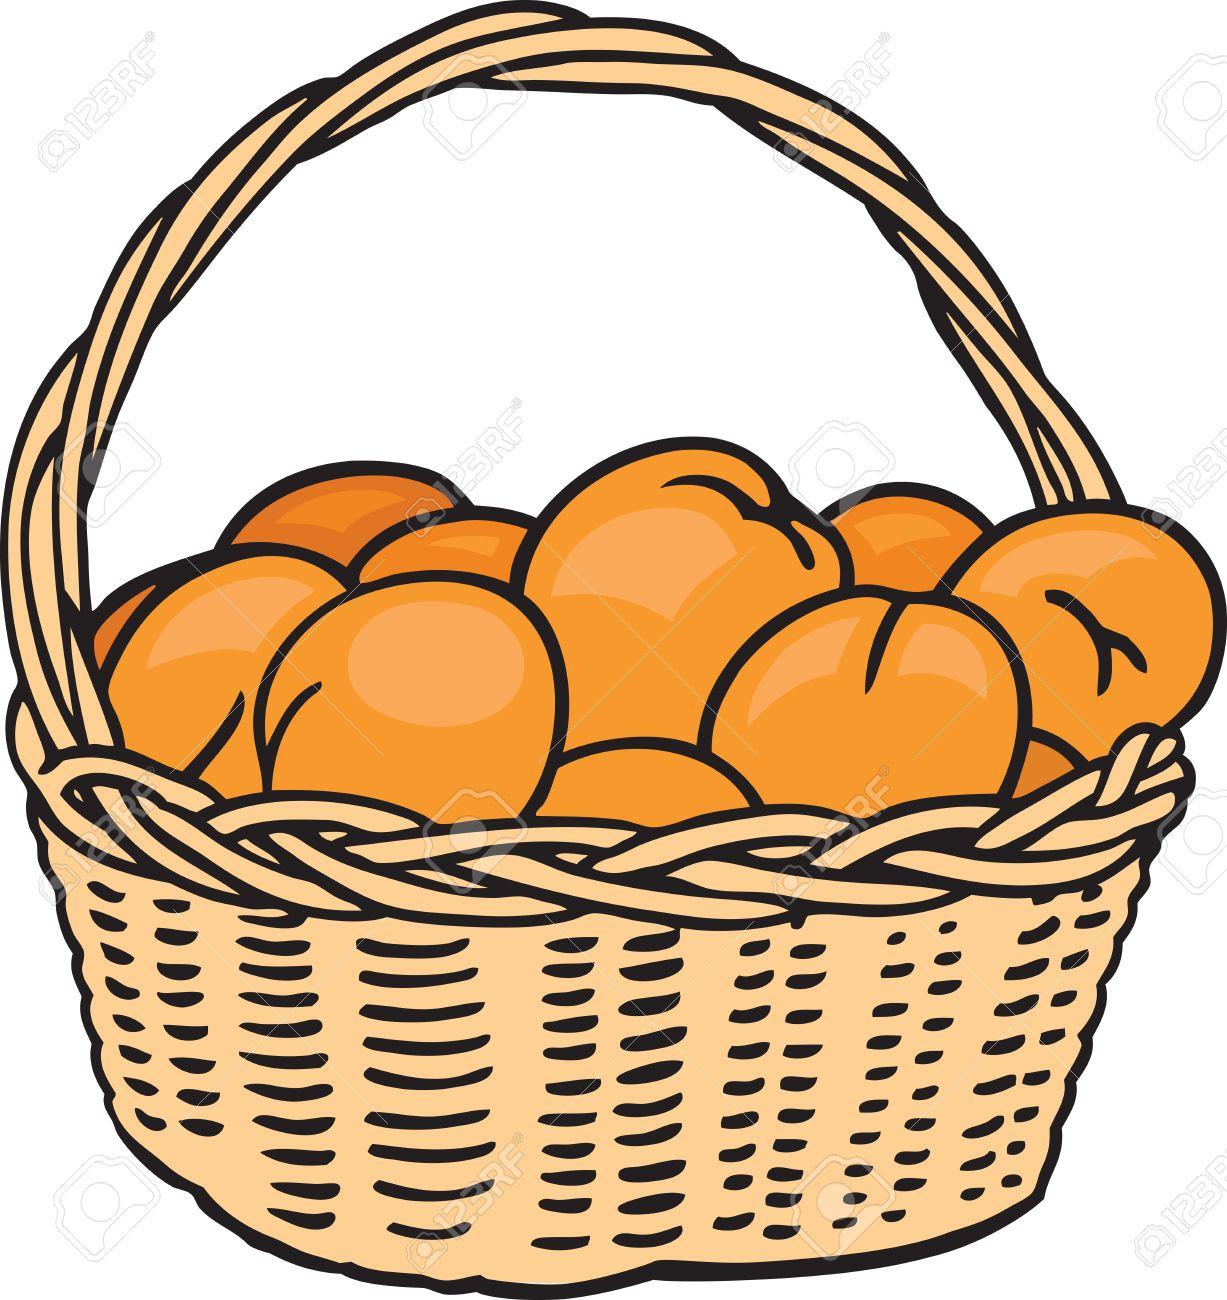 1227x1300 Orange (Fruit) Clipart Basket